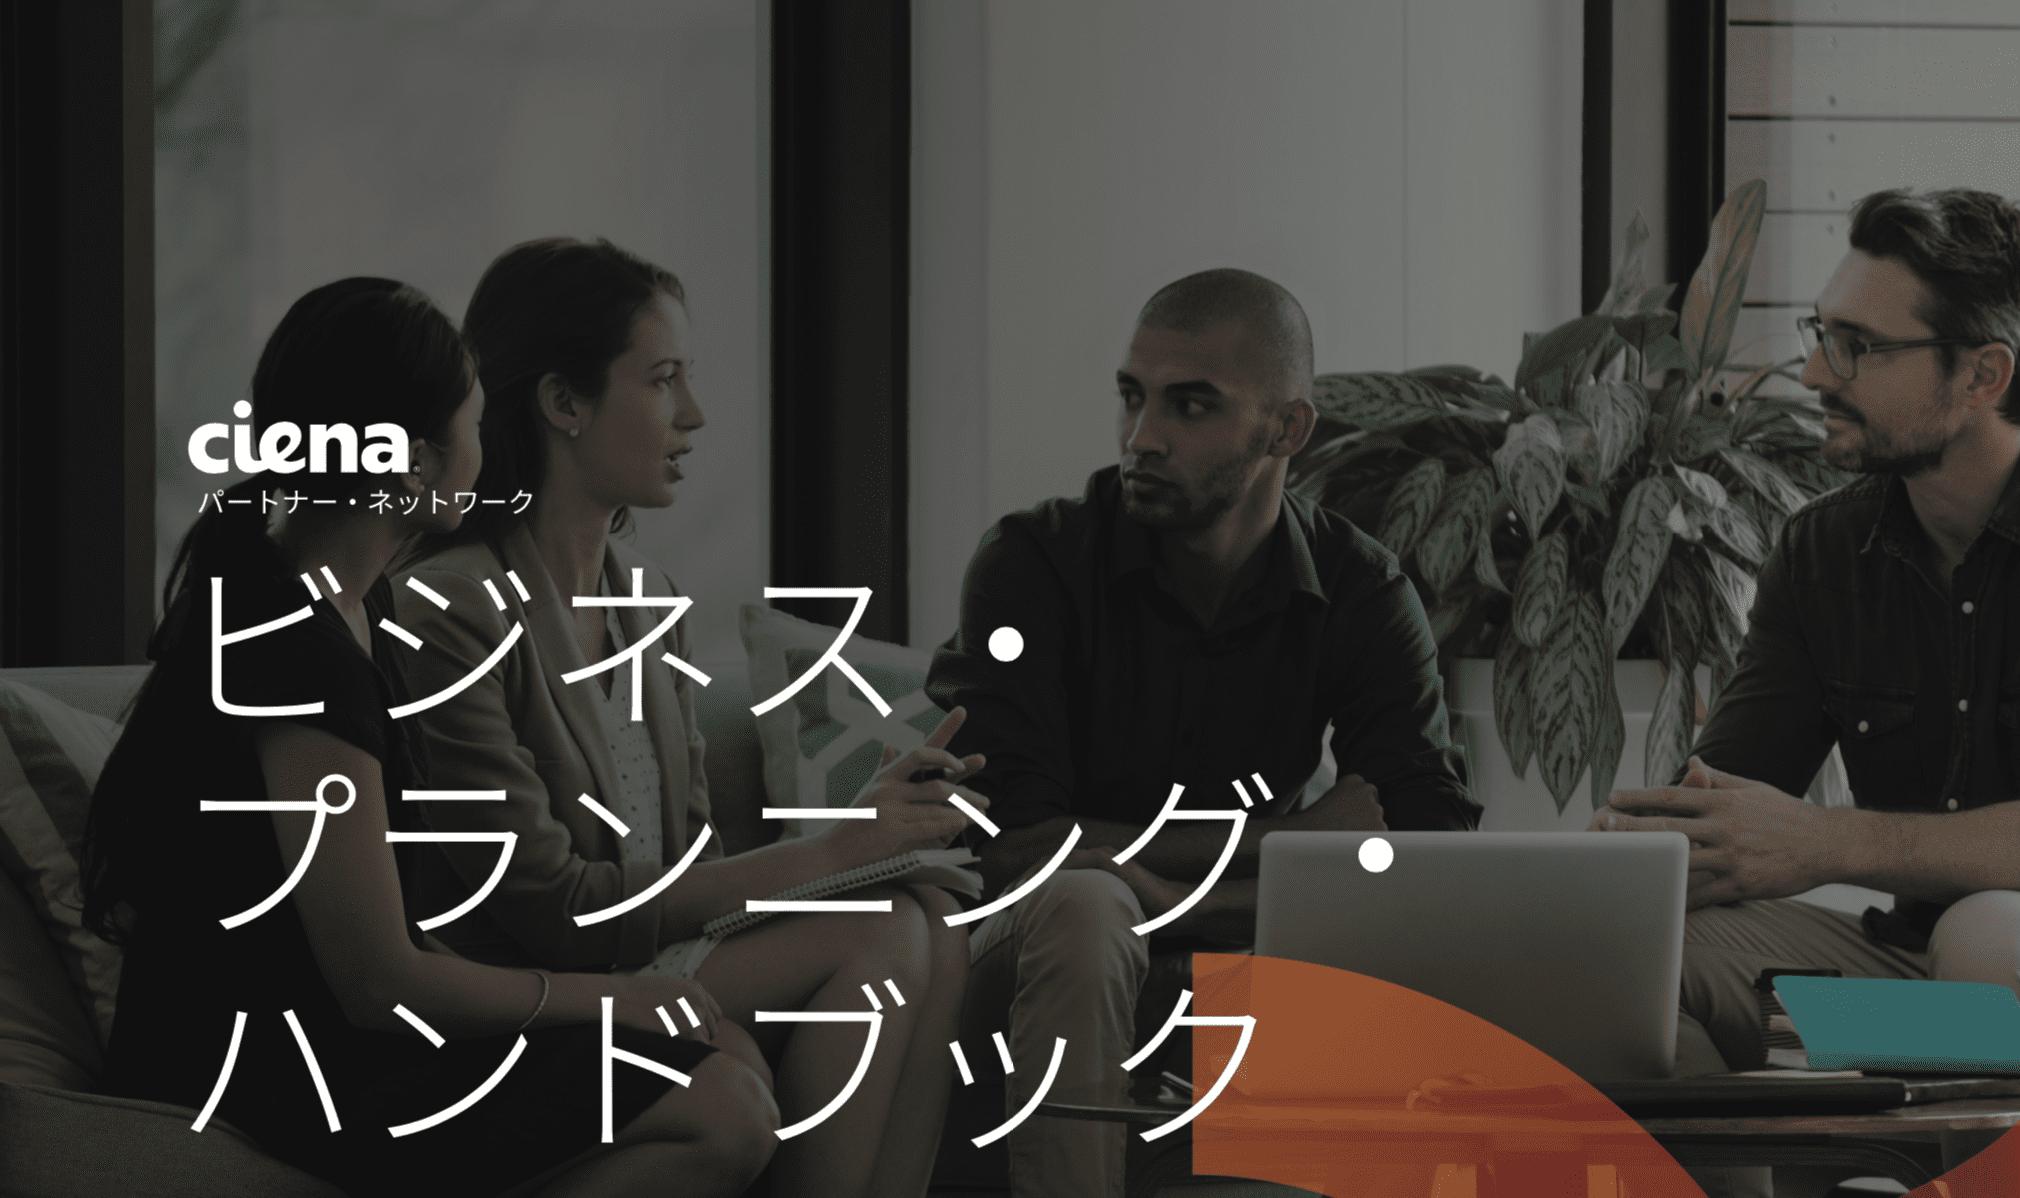 Ciena Japanese brochure